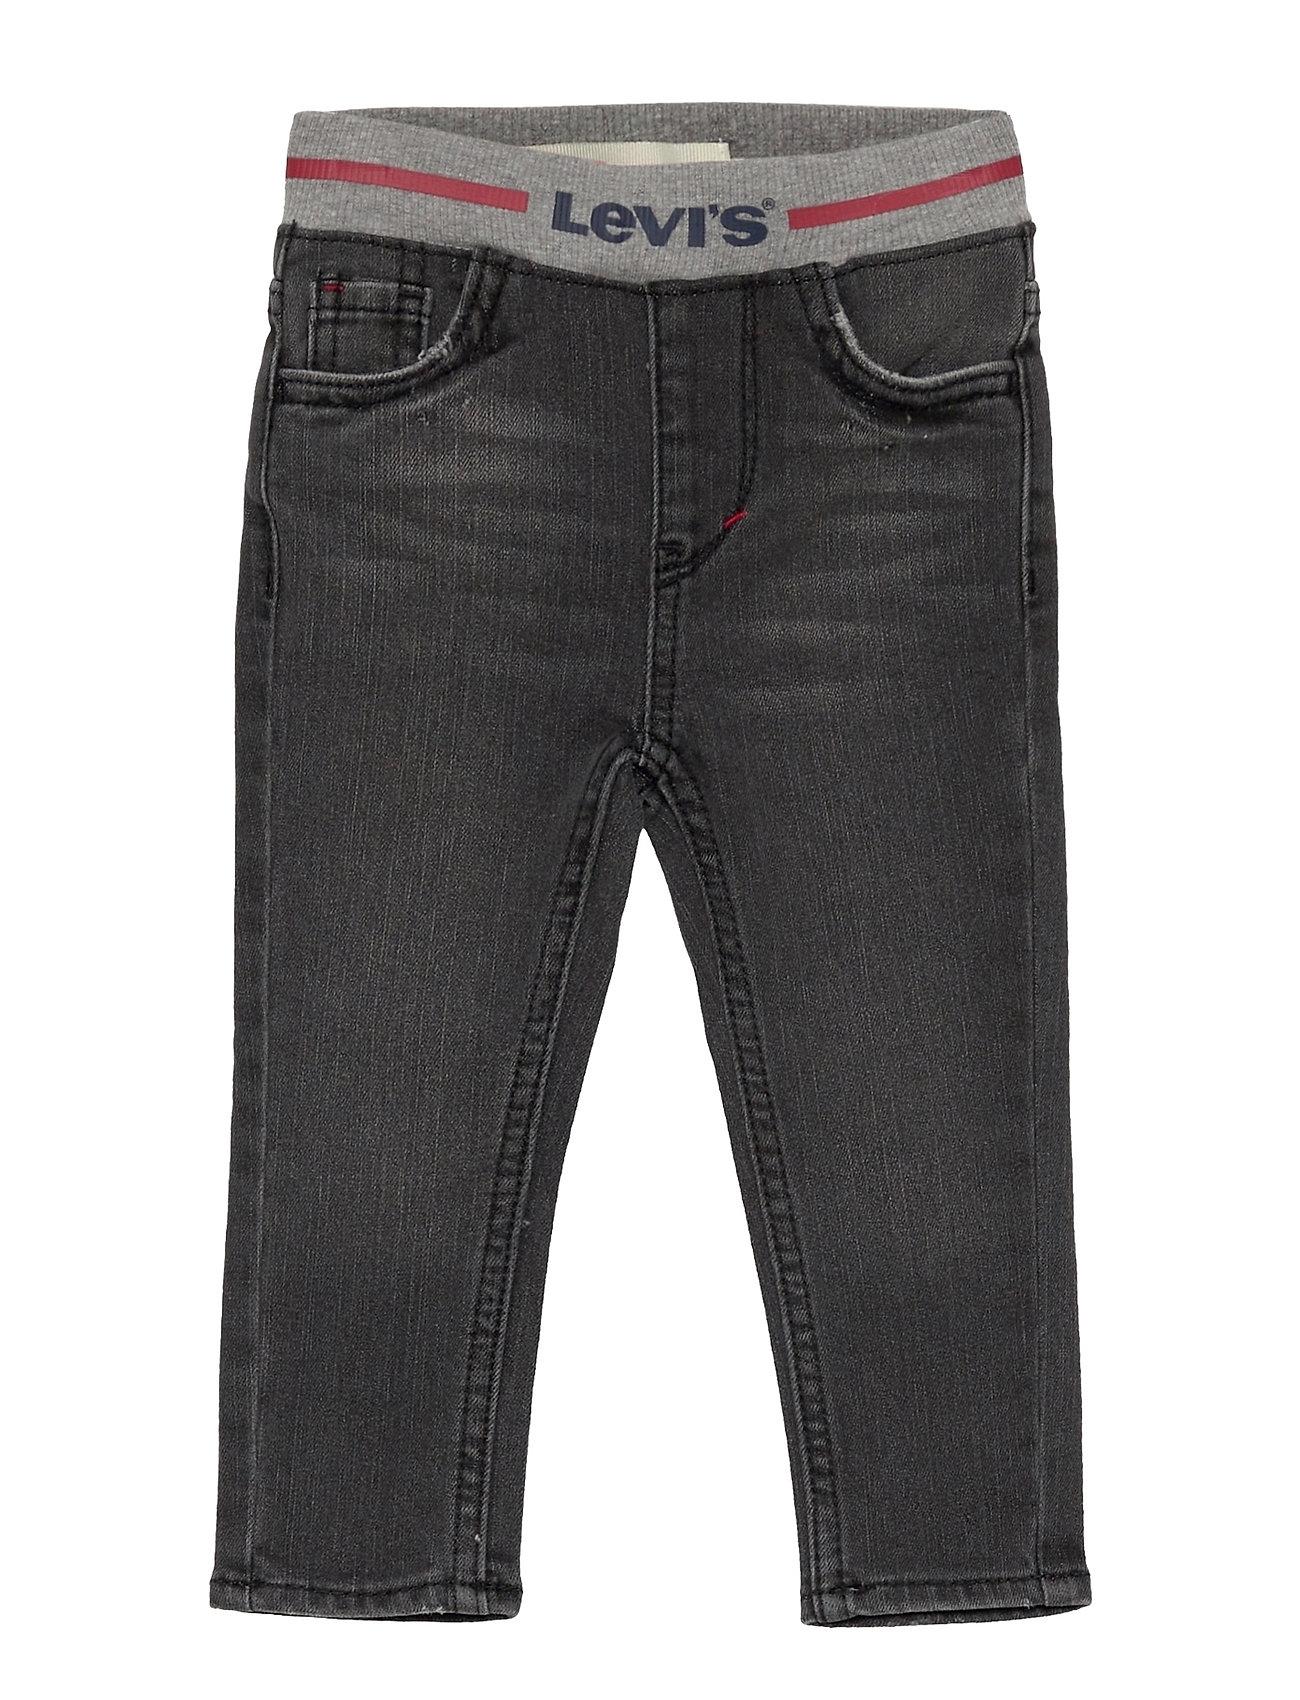 Lvb The Warm Pull On Skinny Jn Jeans Grå Levi's